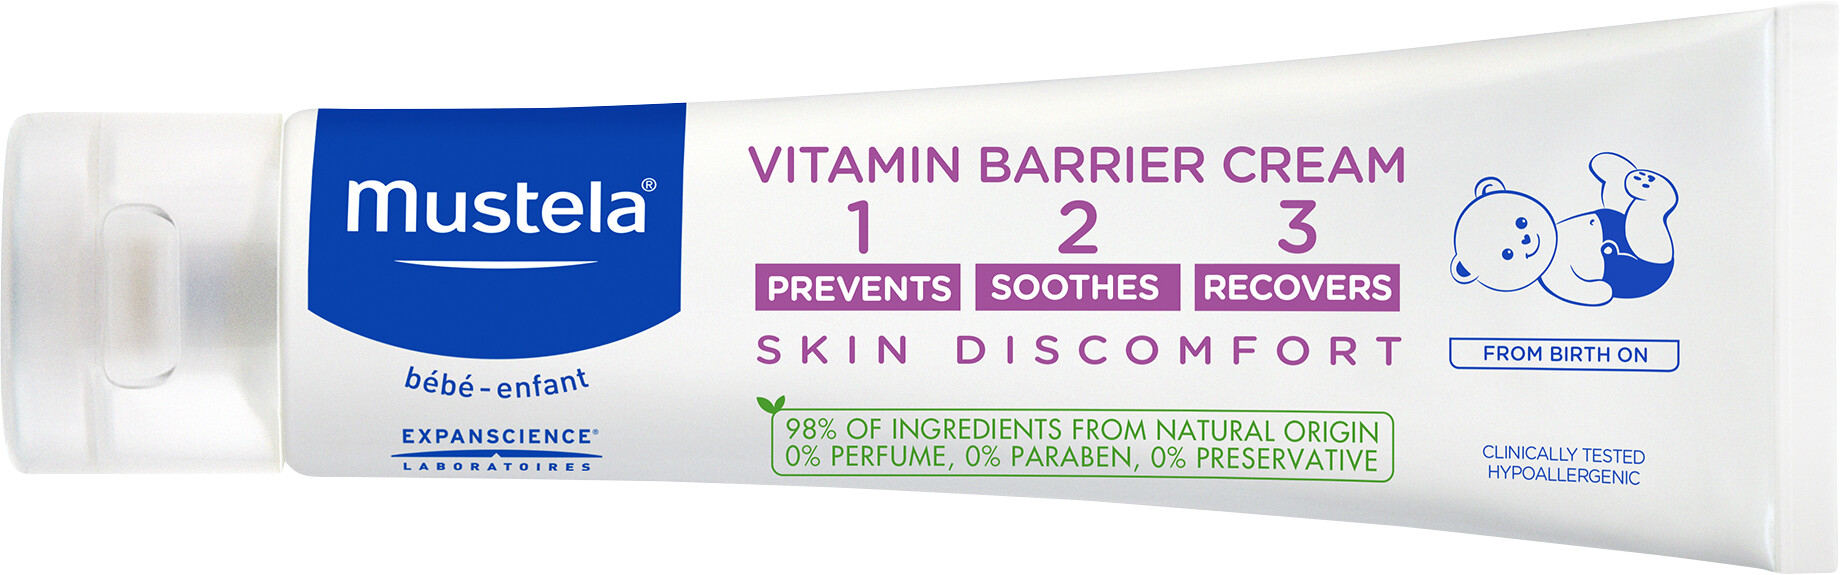 Mustela Vitamin Barrier Skin Discomfort 1-2-3 Cream 100ml